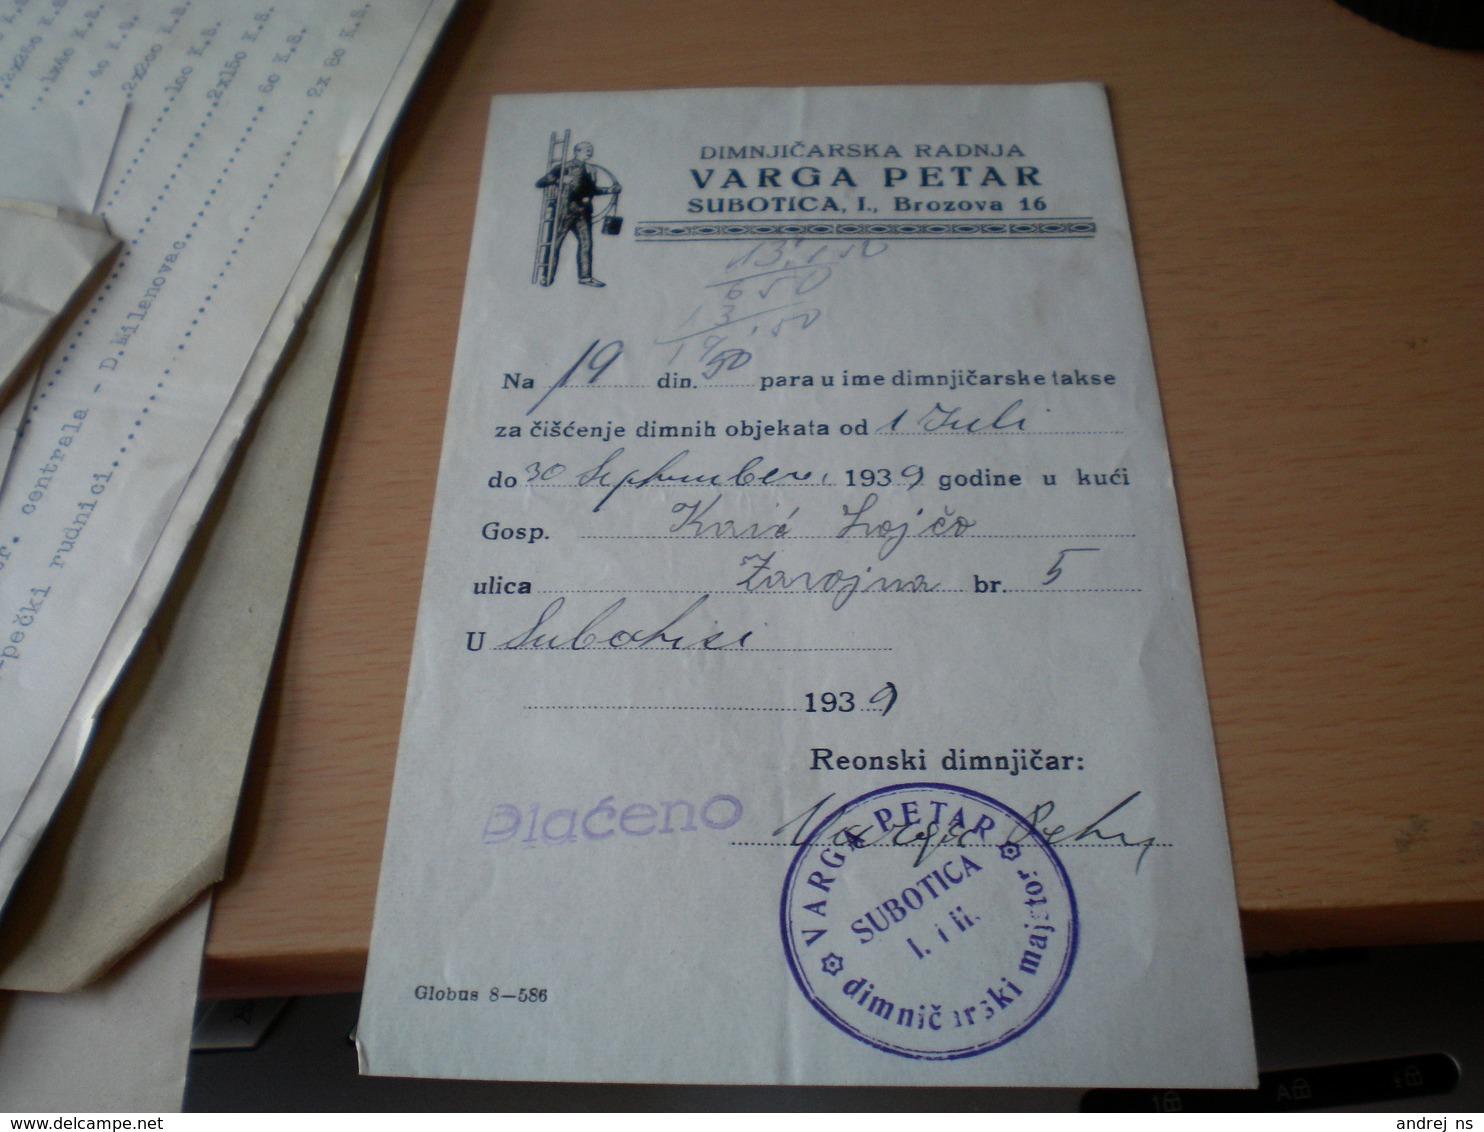 Chimney Sweep Dimnjicar  Varga Petar Subotica 1939 - Facturas & Documentos Mercantiles